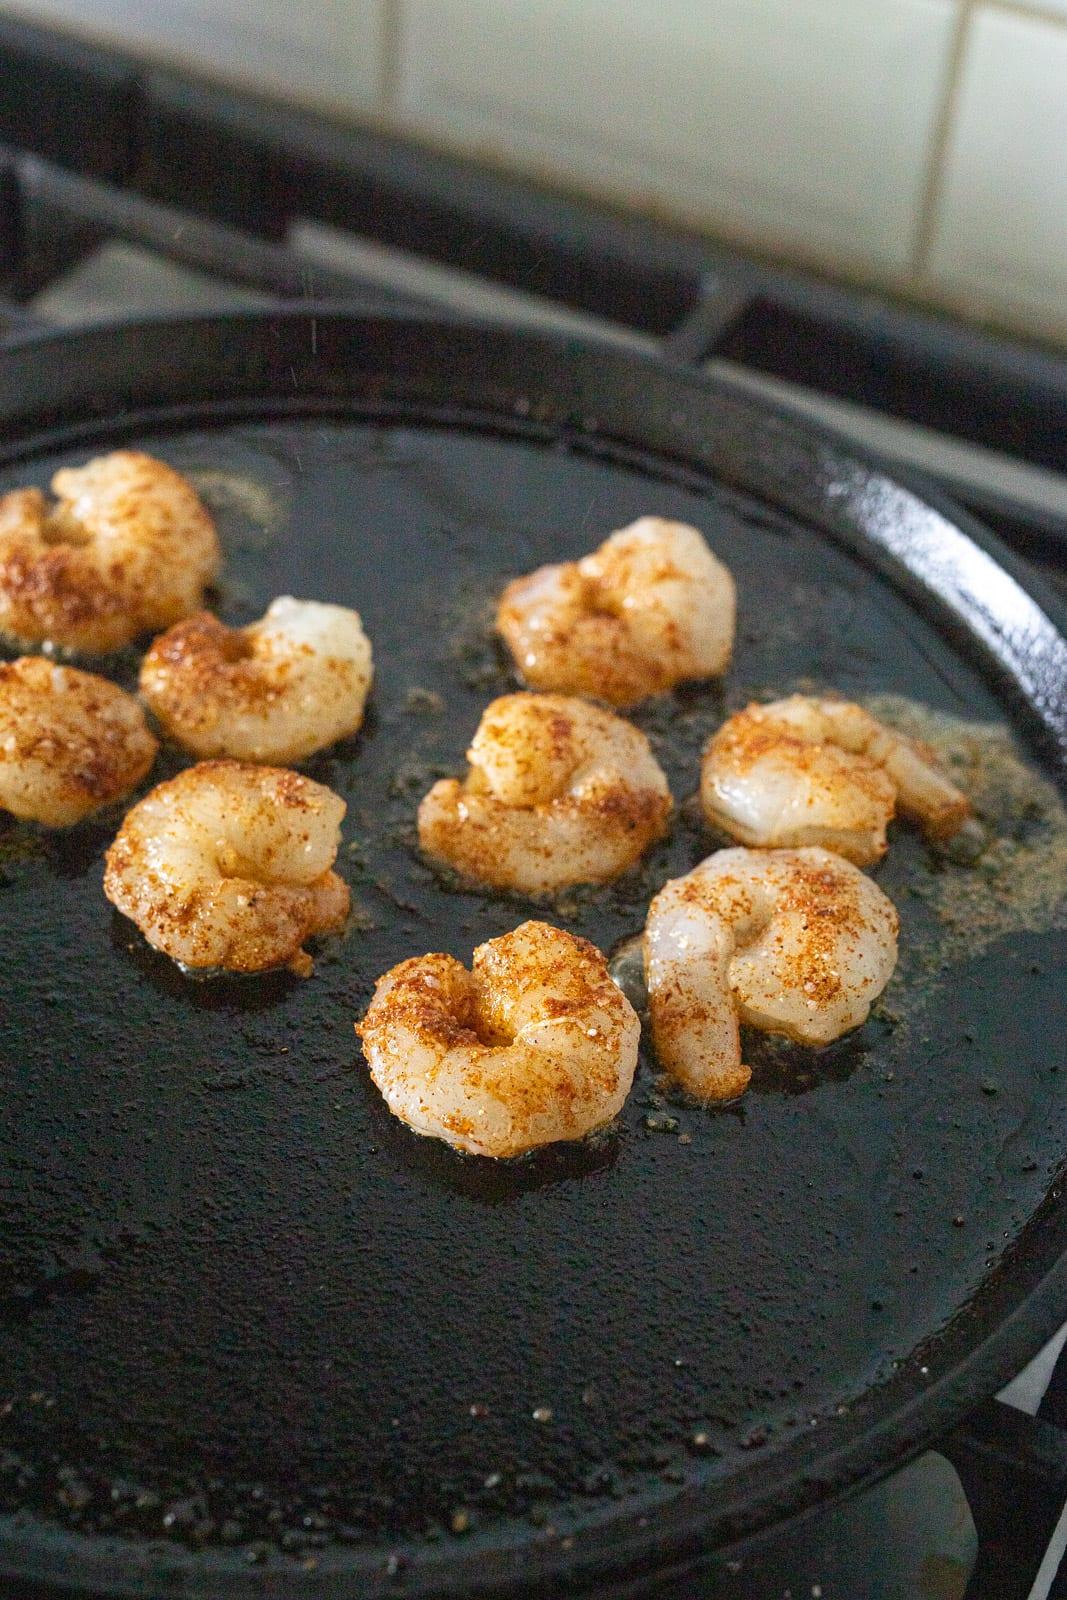 shrimp cooking on a cast iron griddle